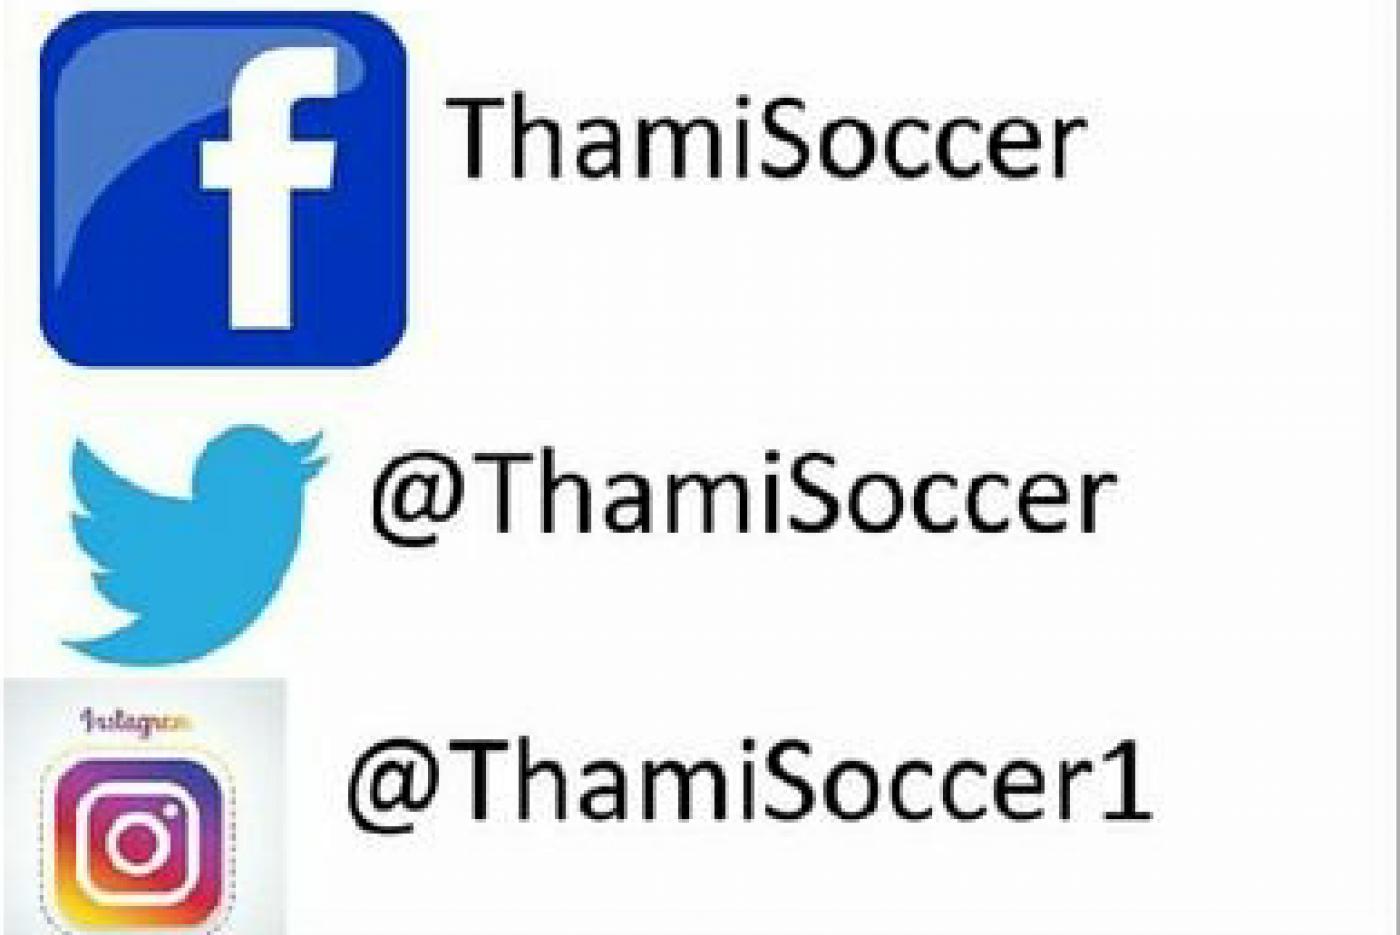 ThamiSoccer